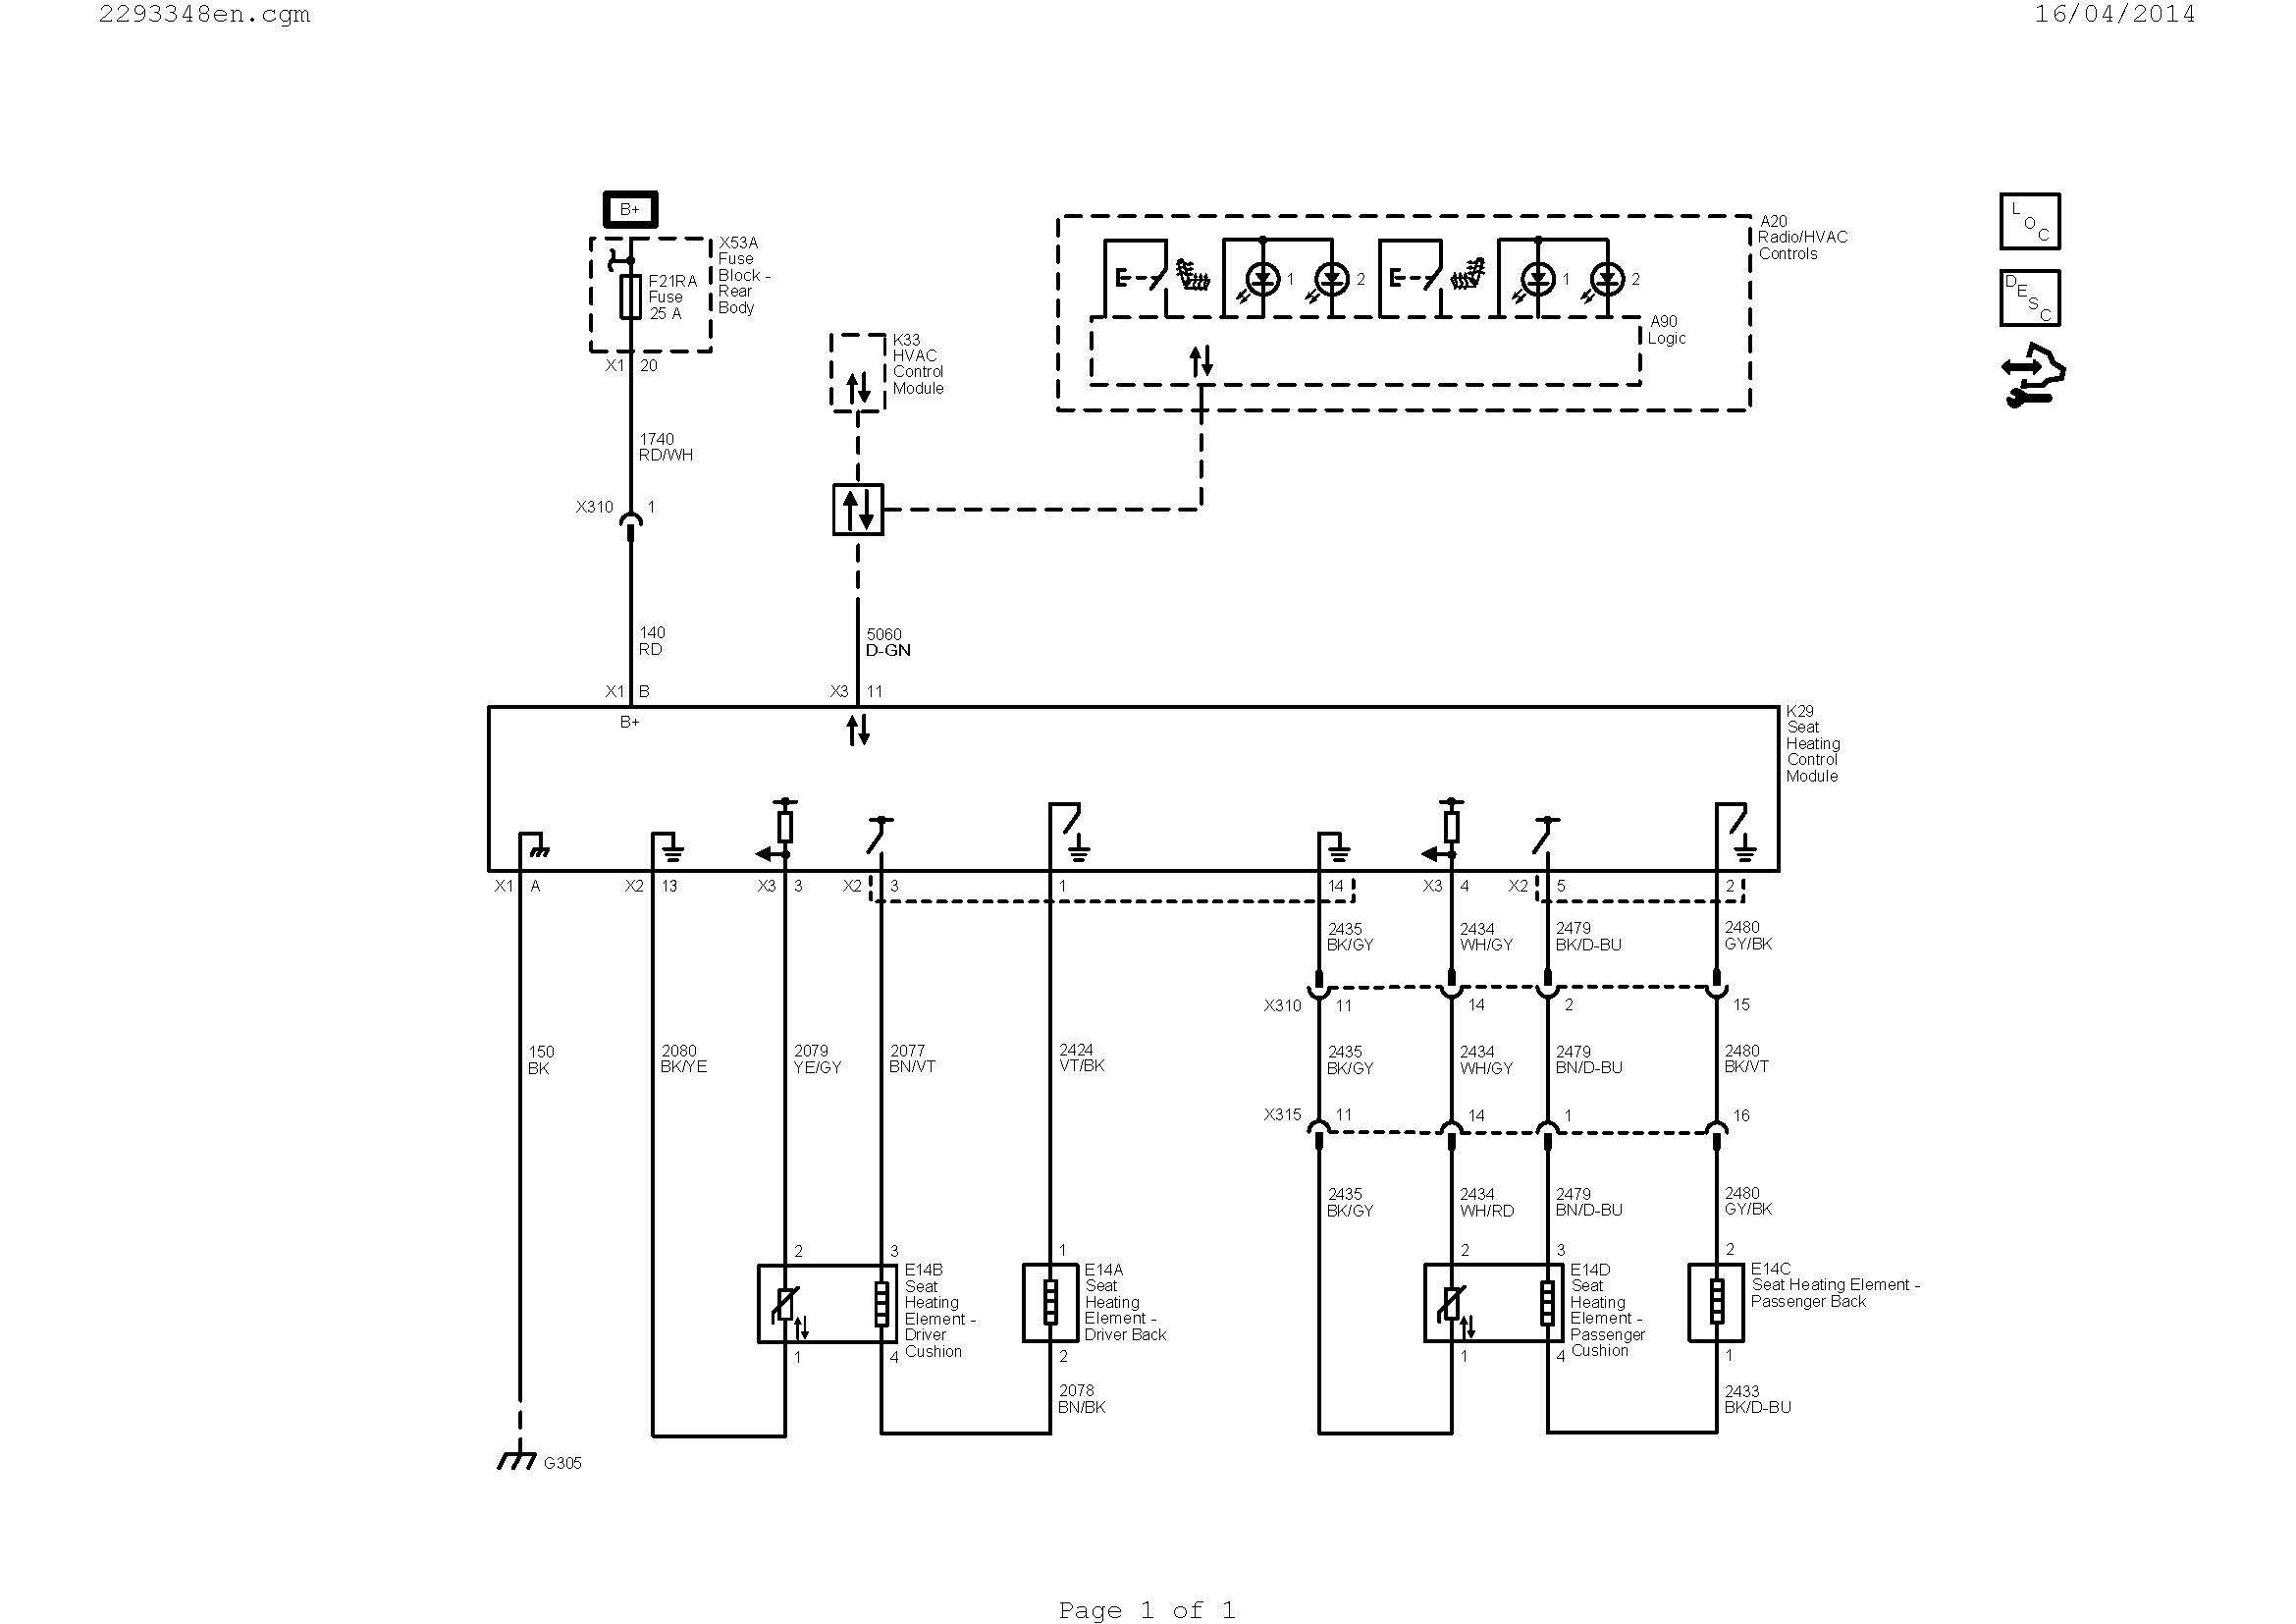 automatic vent damper wiring diagram Collection-Automatic Vent Damper Wiring Diagram 2018 Wiring Diagram Ac Valid Hvac Diagram Best Hvac Diagram 0d – Wire 3-f